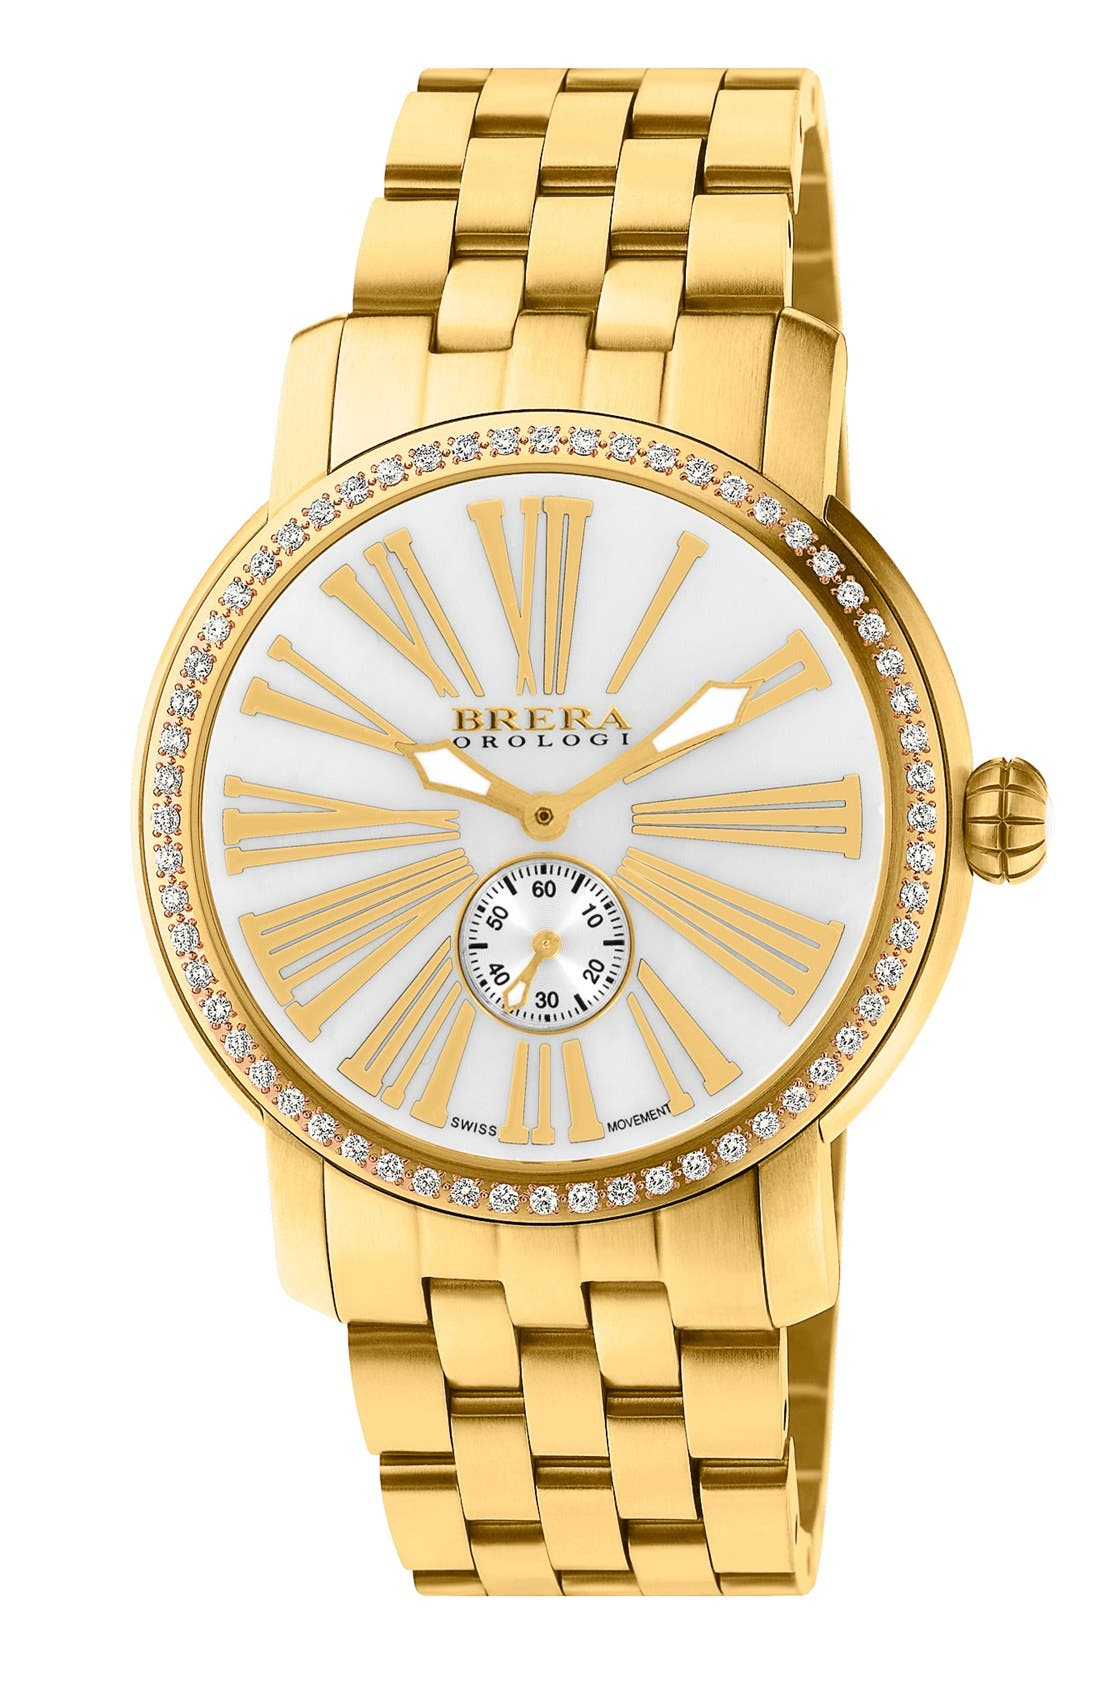 Alternate Image 1 Selected - Brera 'Valentina' Diamond Bracelet Watch, 42mm